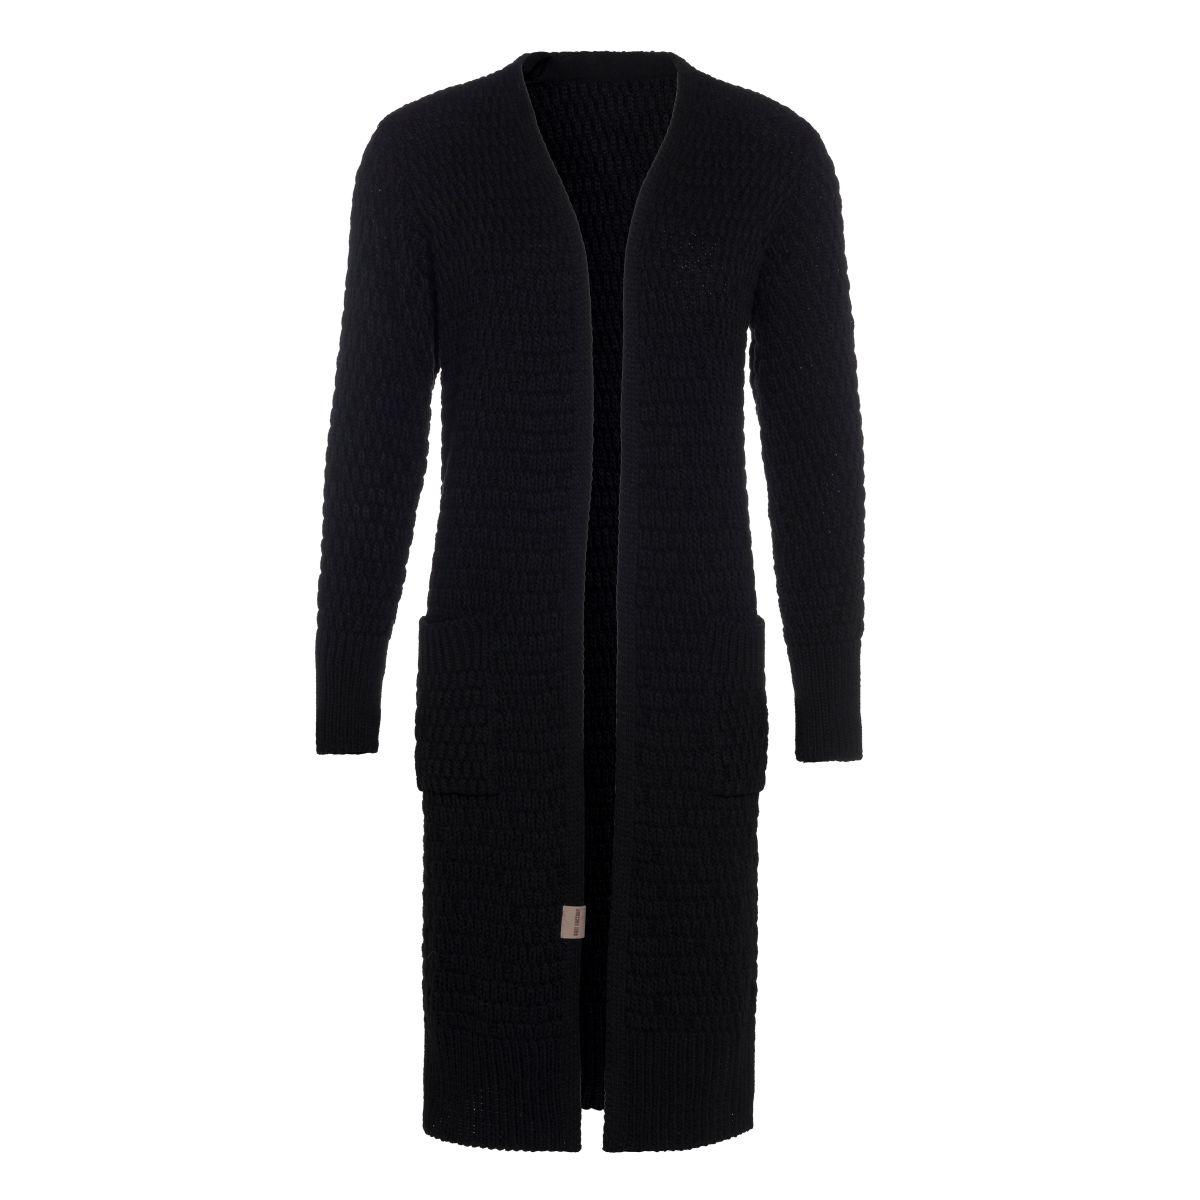 jaida long knitted cardigan black 3638 with side pockets